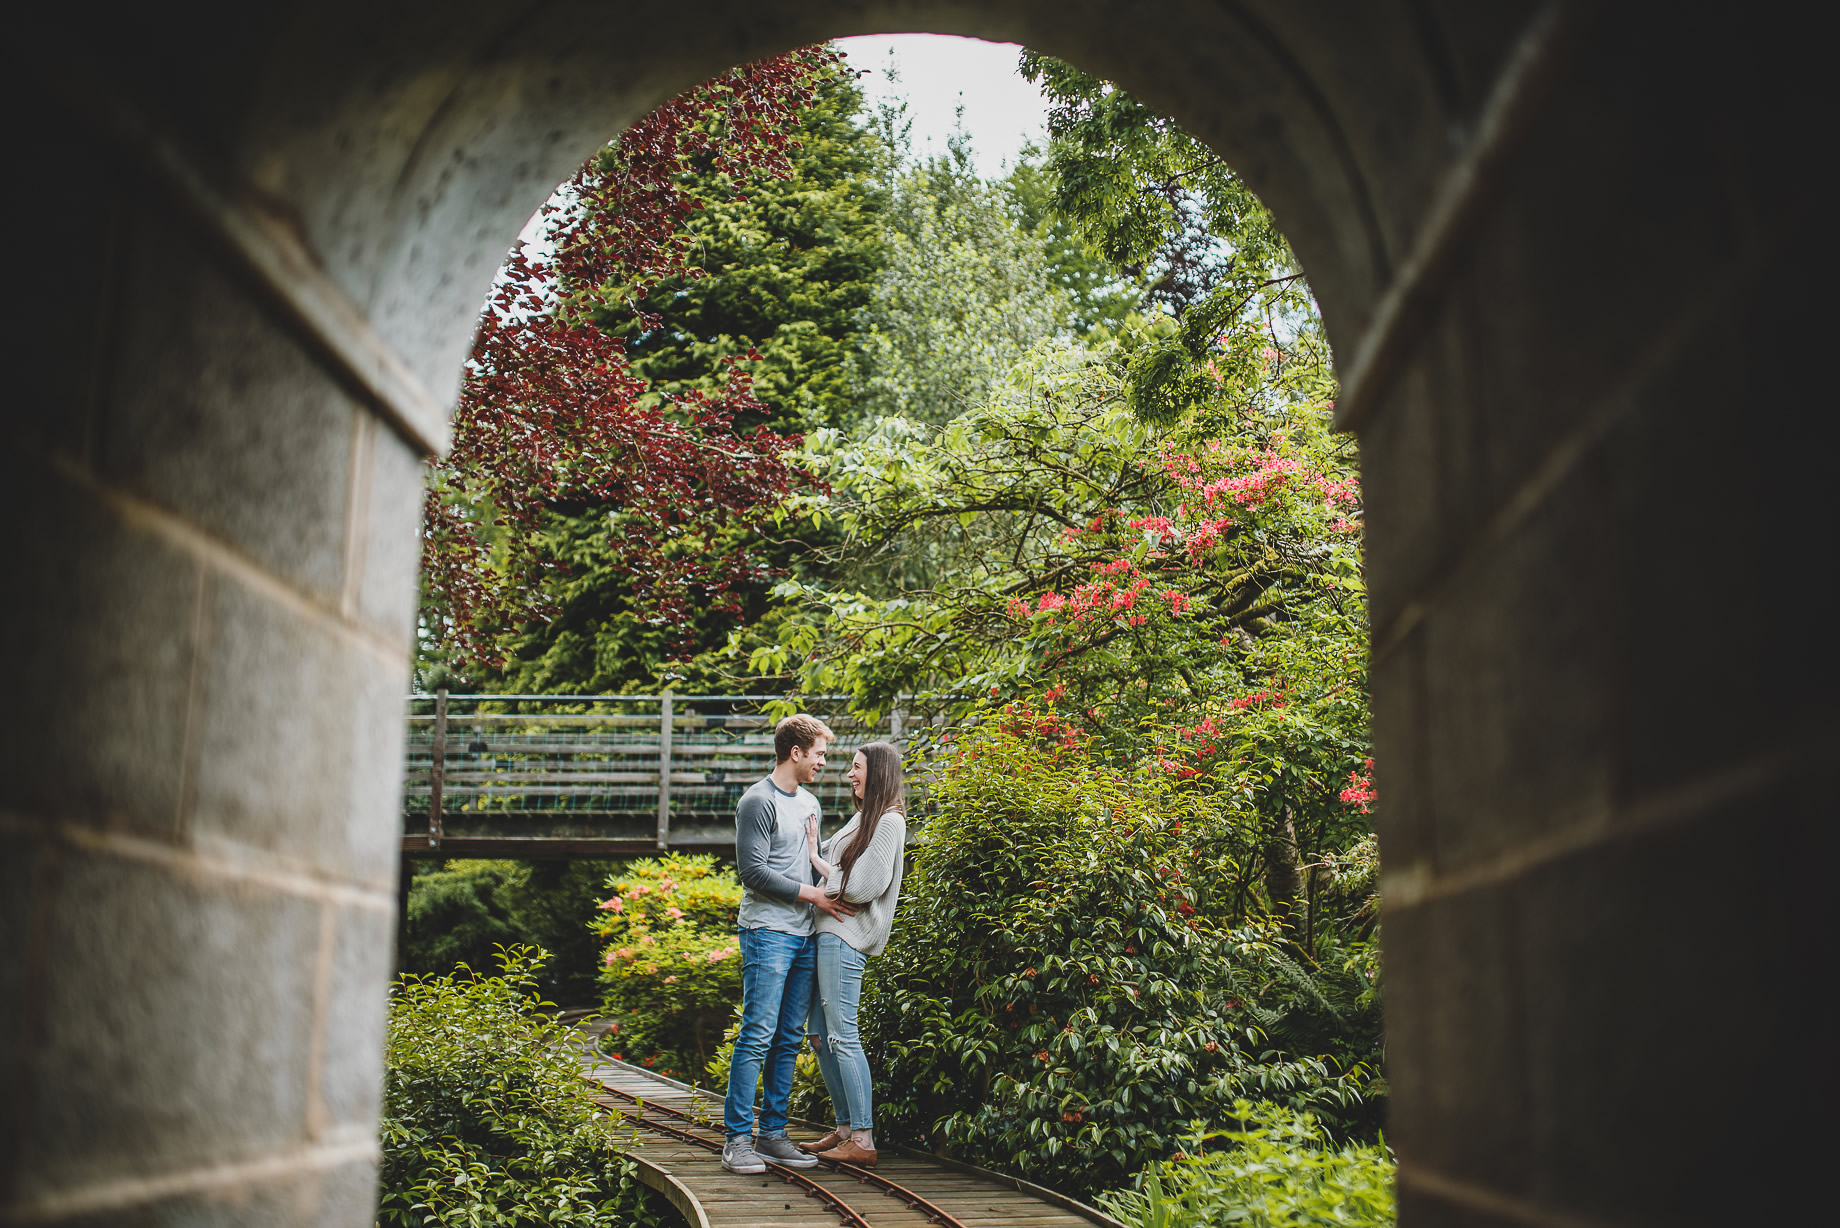 Becky and Emmett's Pre-Wedding Shoot in Scorton 011